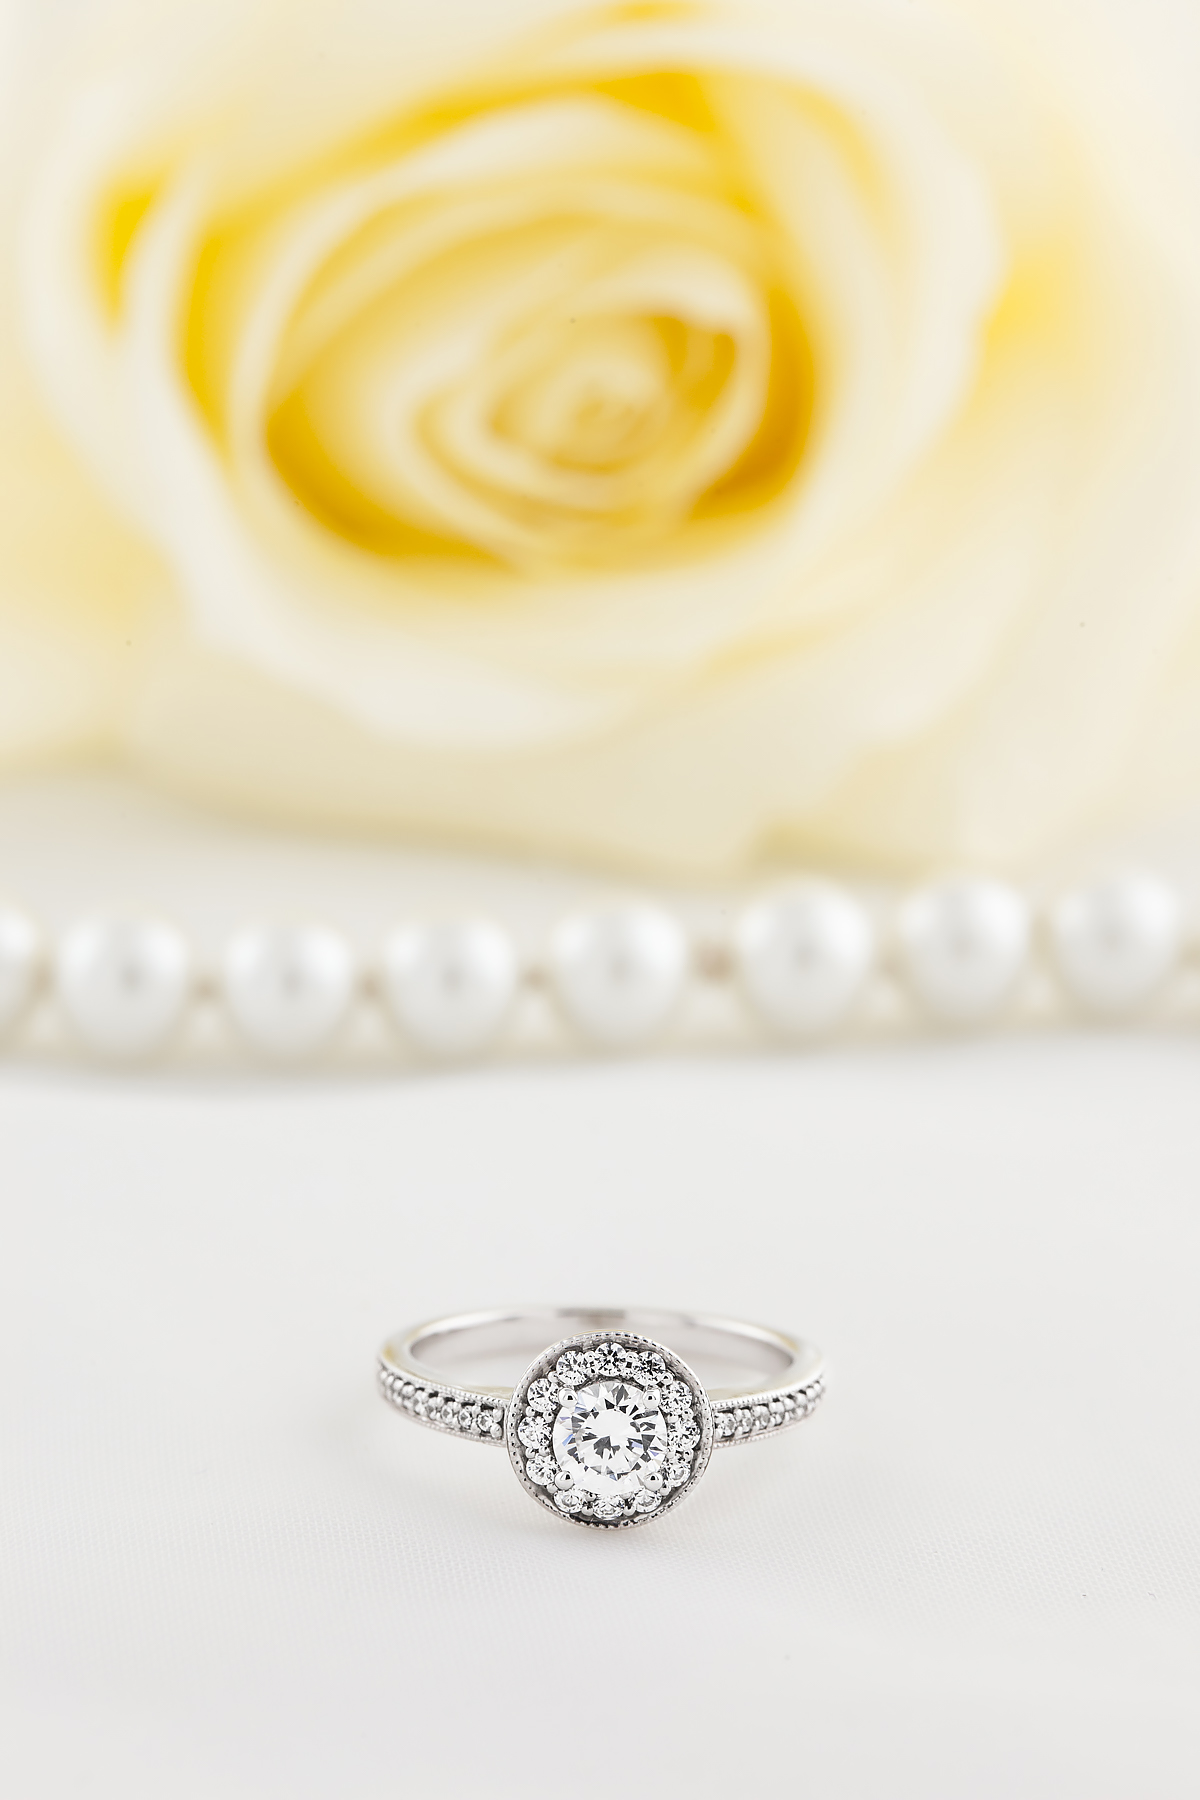 Inel de Logodna Solitaire cu Diamante Mici pe Lateral Dama Platina cu un Diamant Rotund Briliant in Setare 4-Gheare inconjurat de Diamante Rotunde Briliant Mici-img1